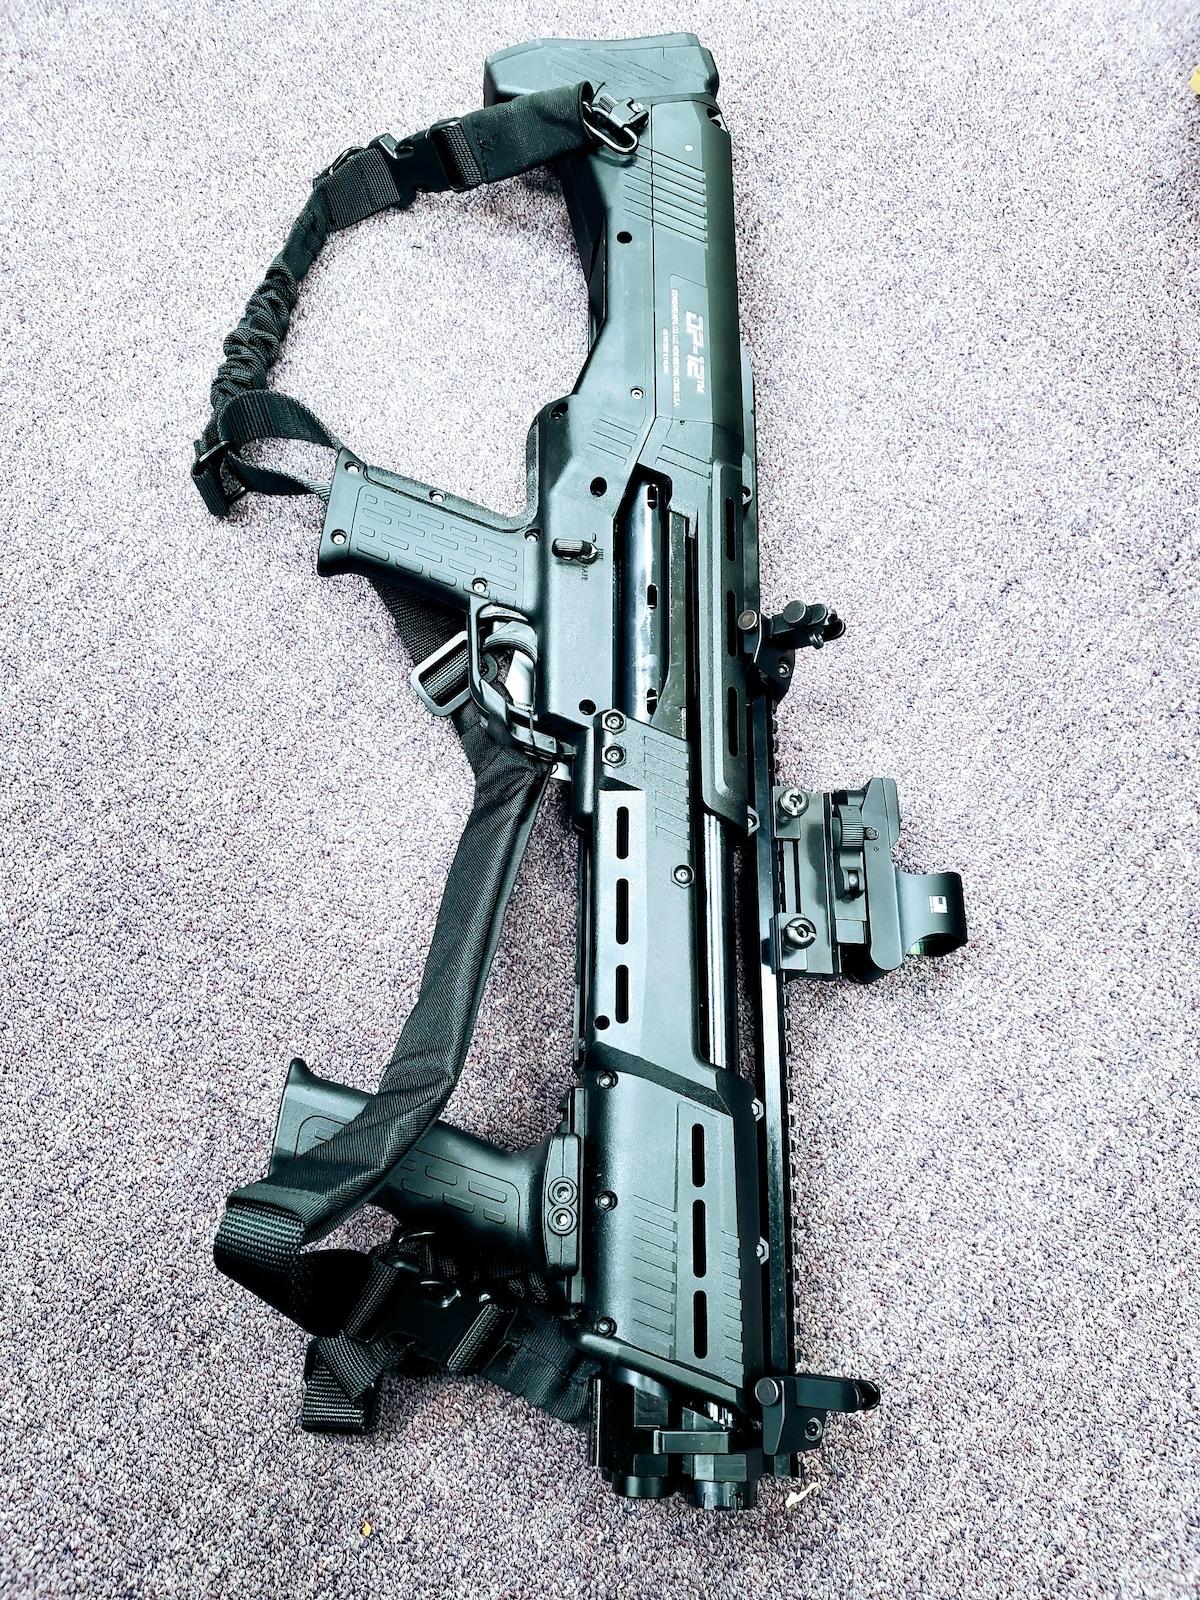 STANDARD MFG. fully loaded dp12 Double Barrel Pump Shotgun